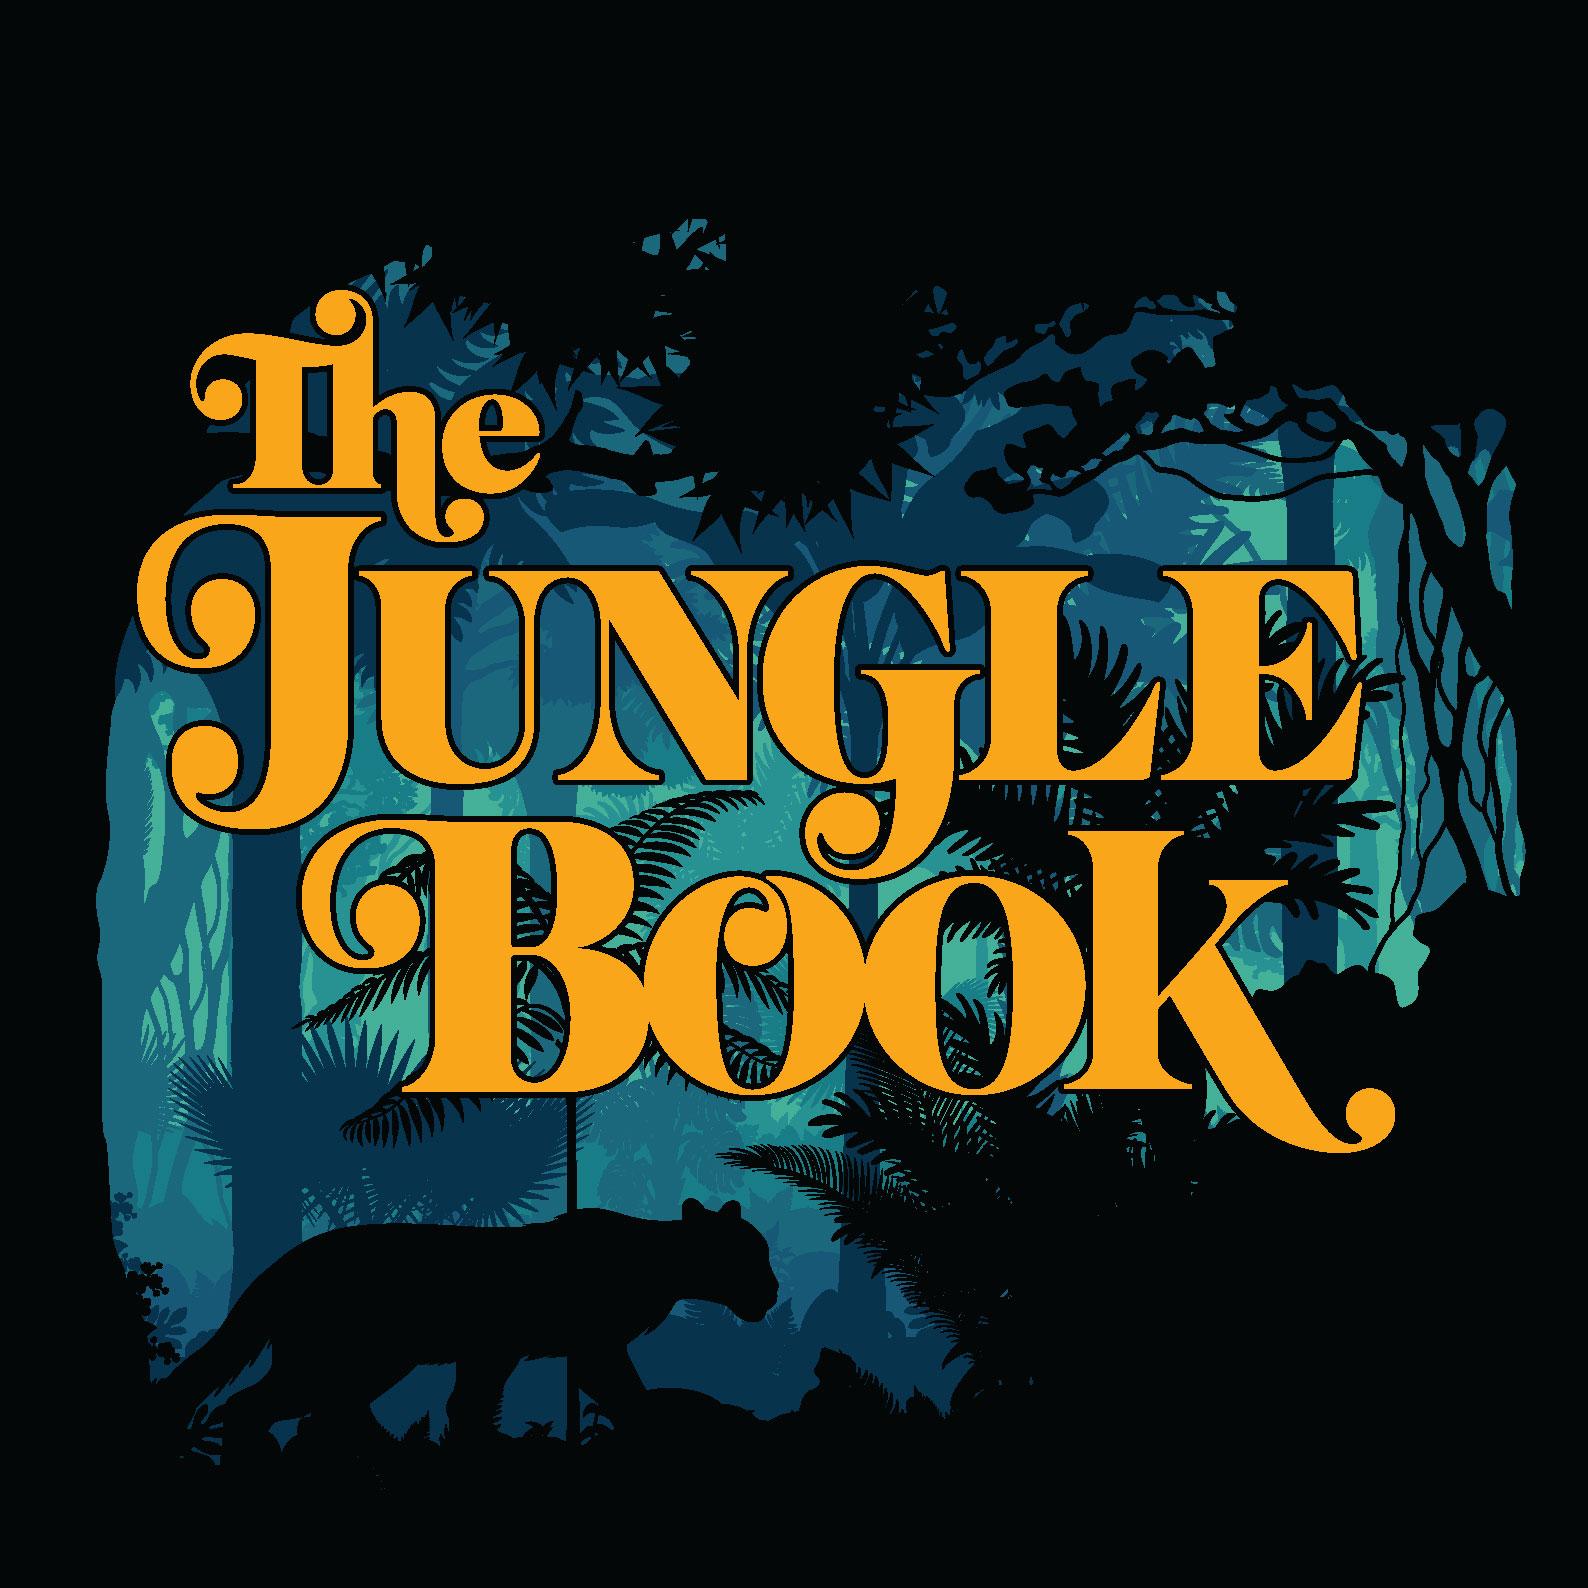 The Jungle Book 2020